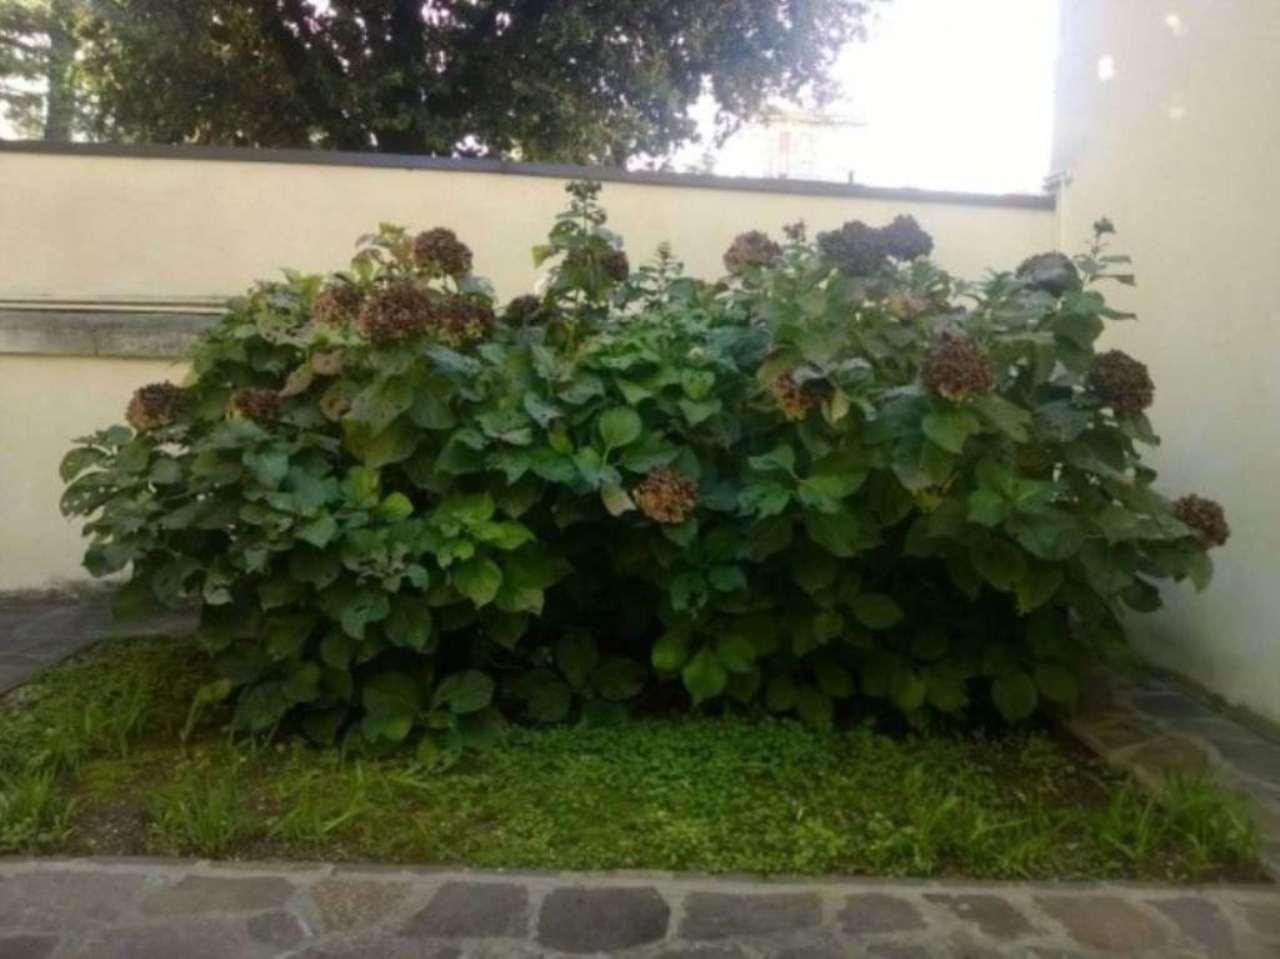 Bilocale Ravenna Via Giovanni Pascoli 5